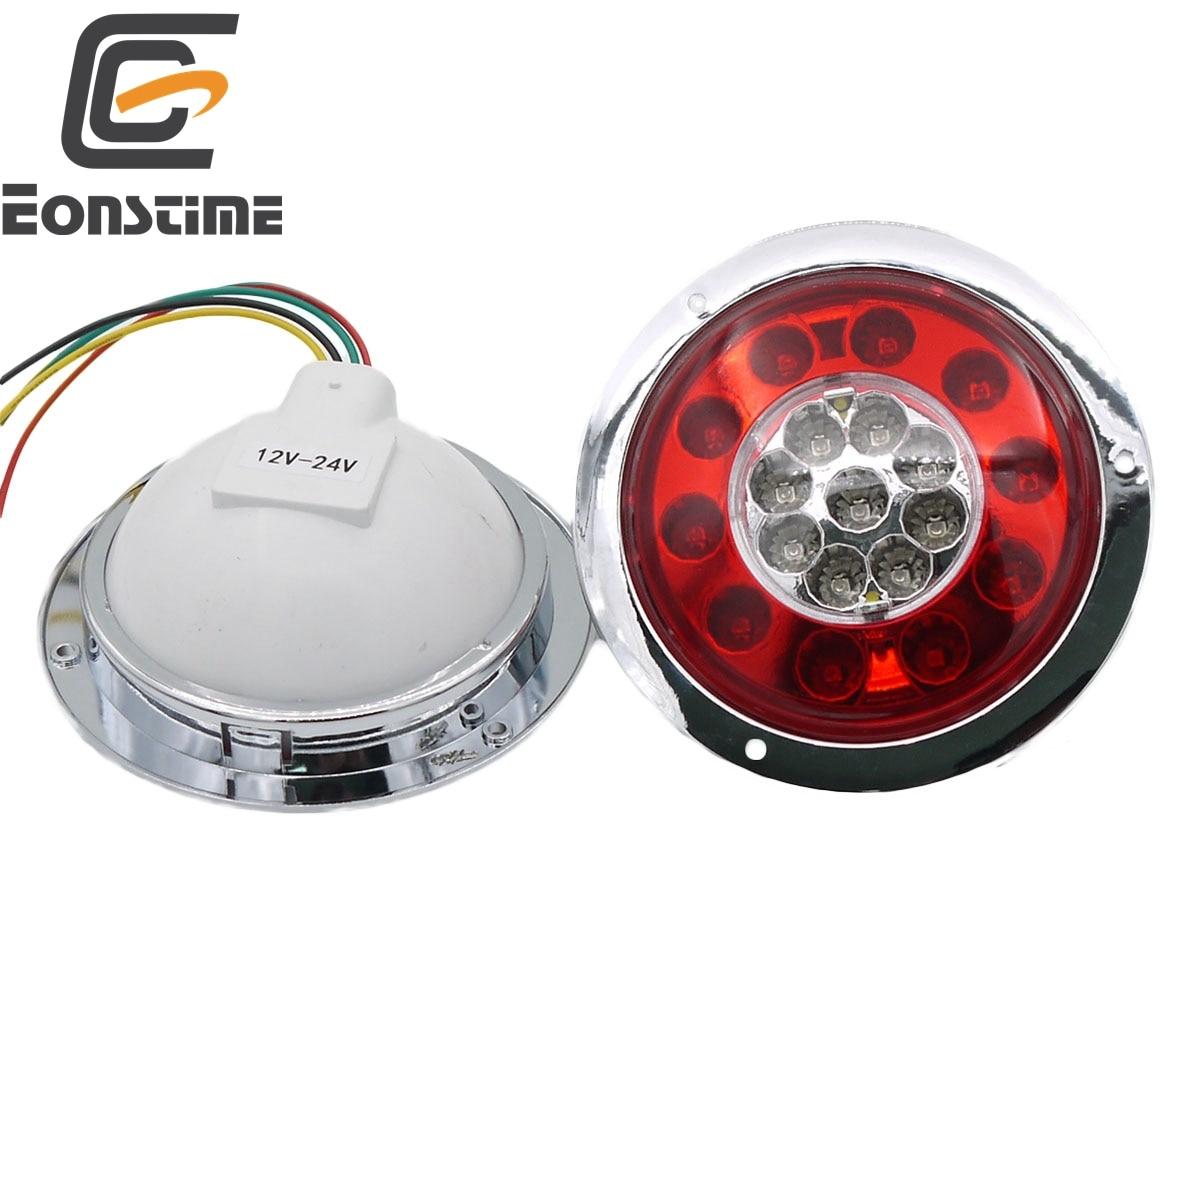 Eonstime 2pcs 12V 24V Car Side font b Lamp b font Light 19LED Truck Trailer Lorry